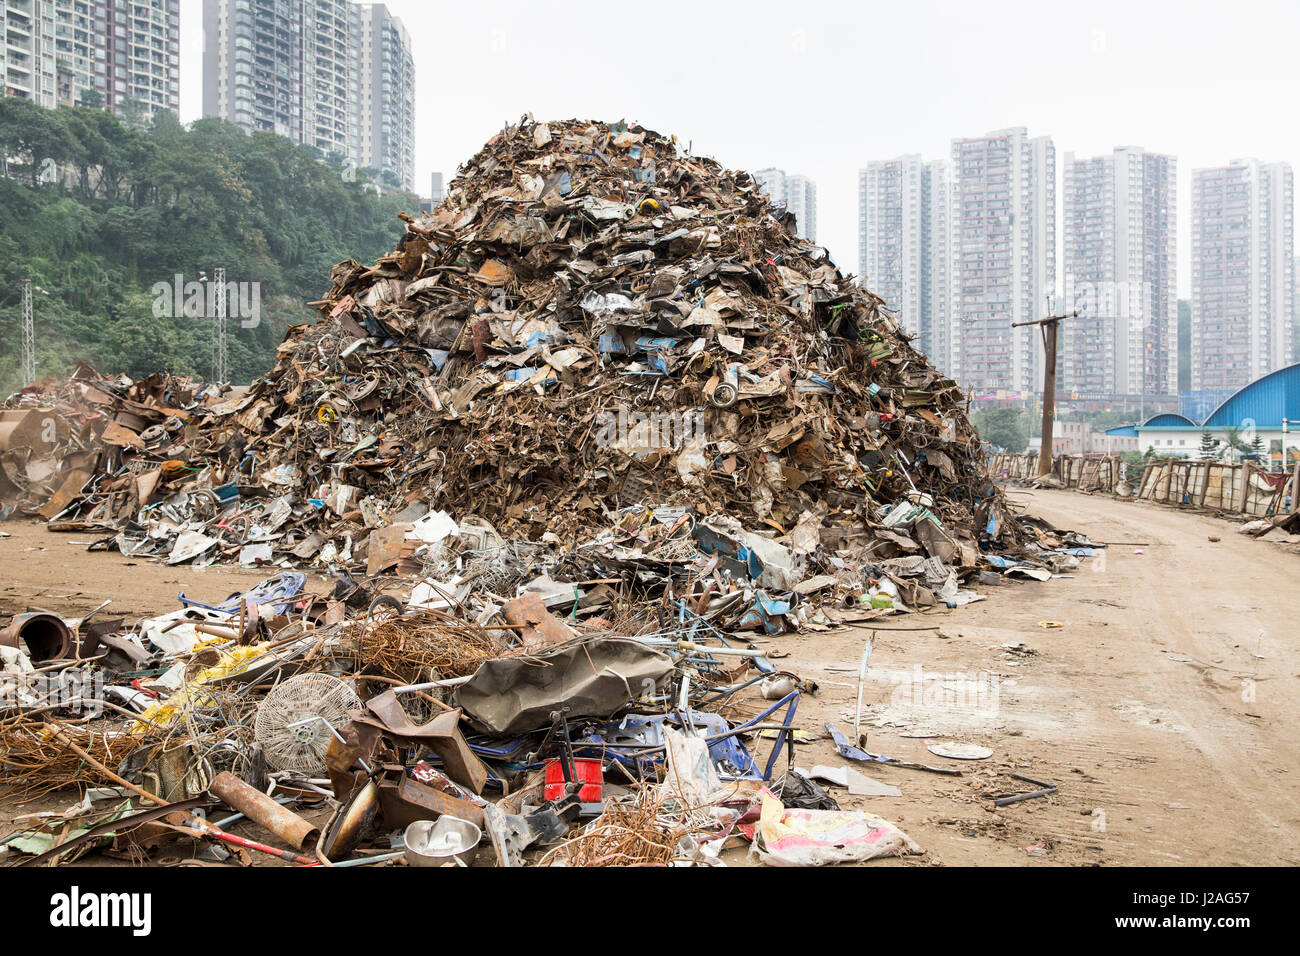 China, Chongqing, Massive pile of garbage and scrap metal outside cargo railroad terminal along Yangtze River - Stock Image